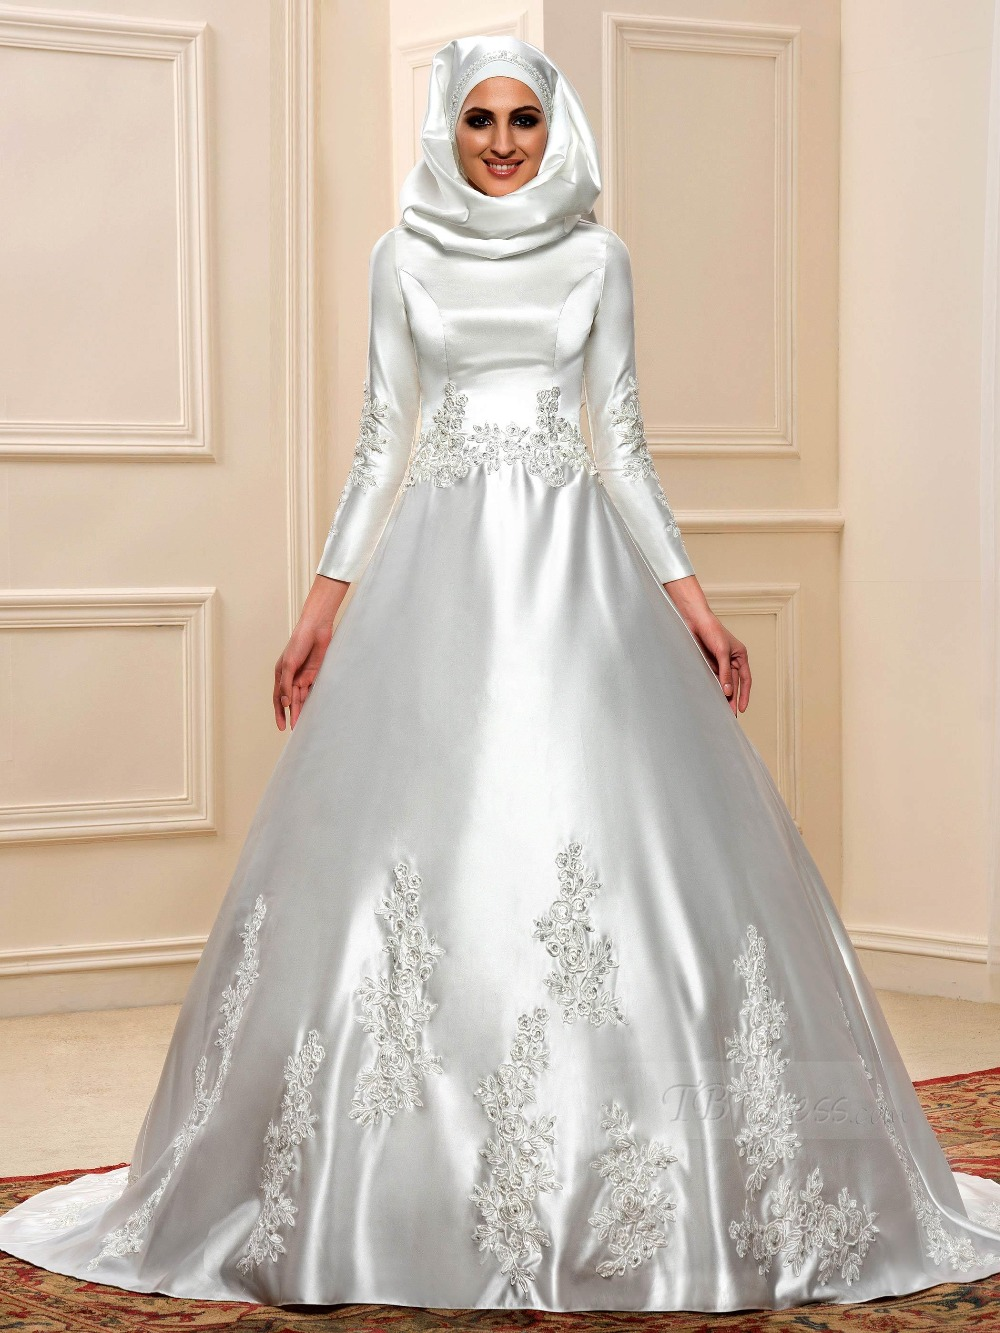 long sleeved wedding dresses 2017 muslim dress women